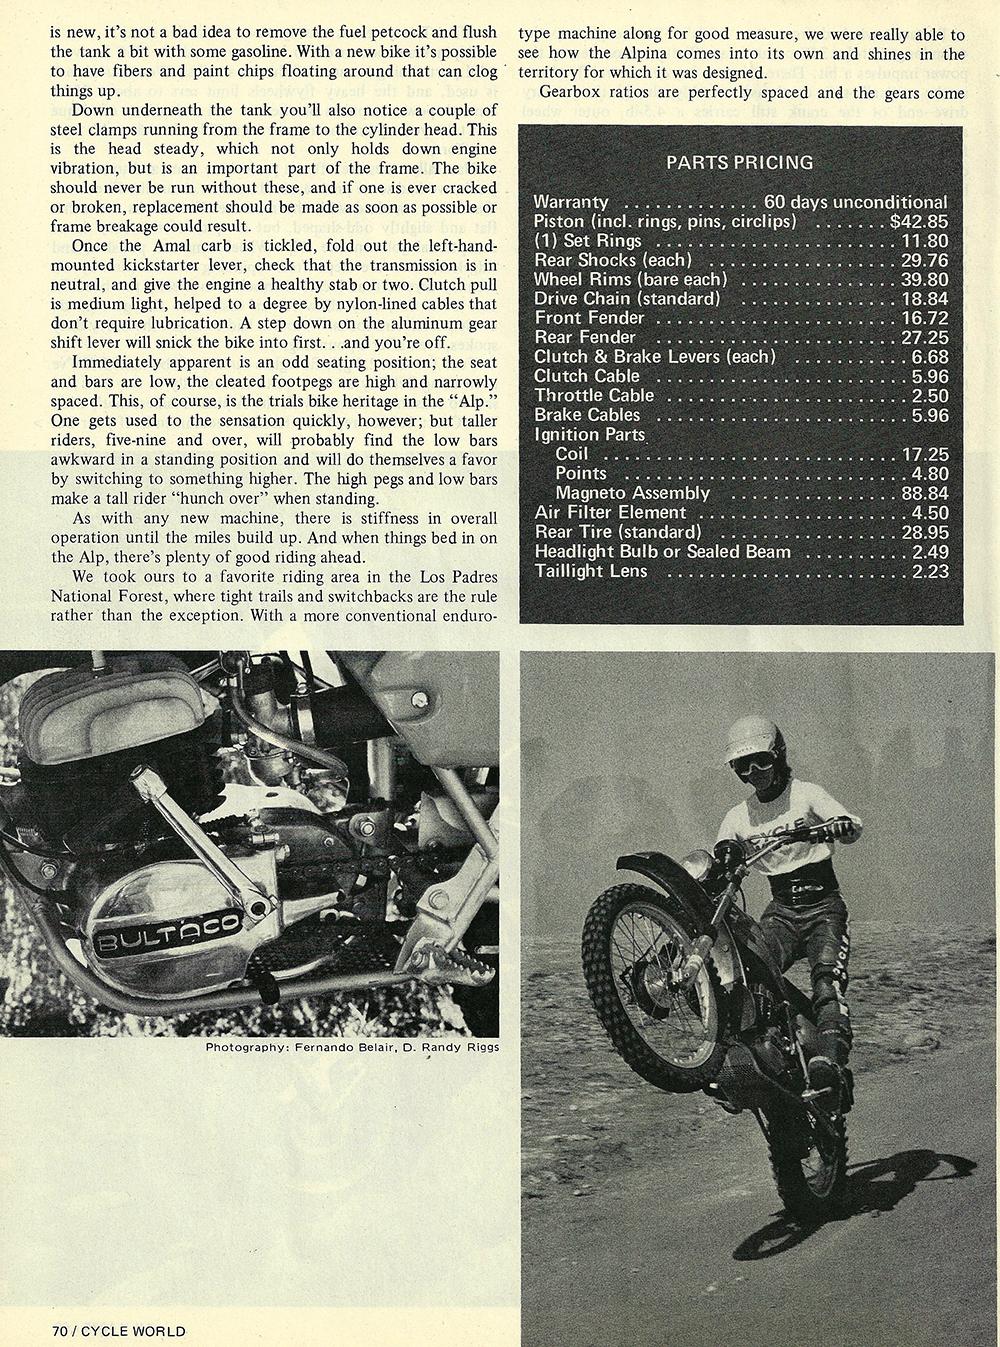 1975 Bultaco Alpina 350 road test 05.jpg